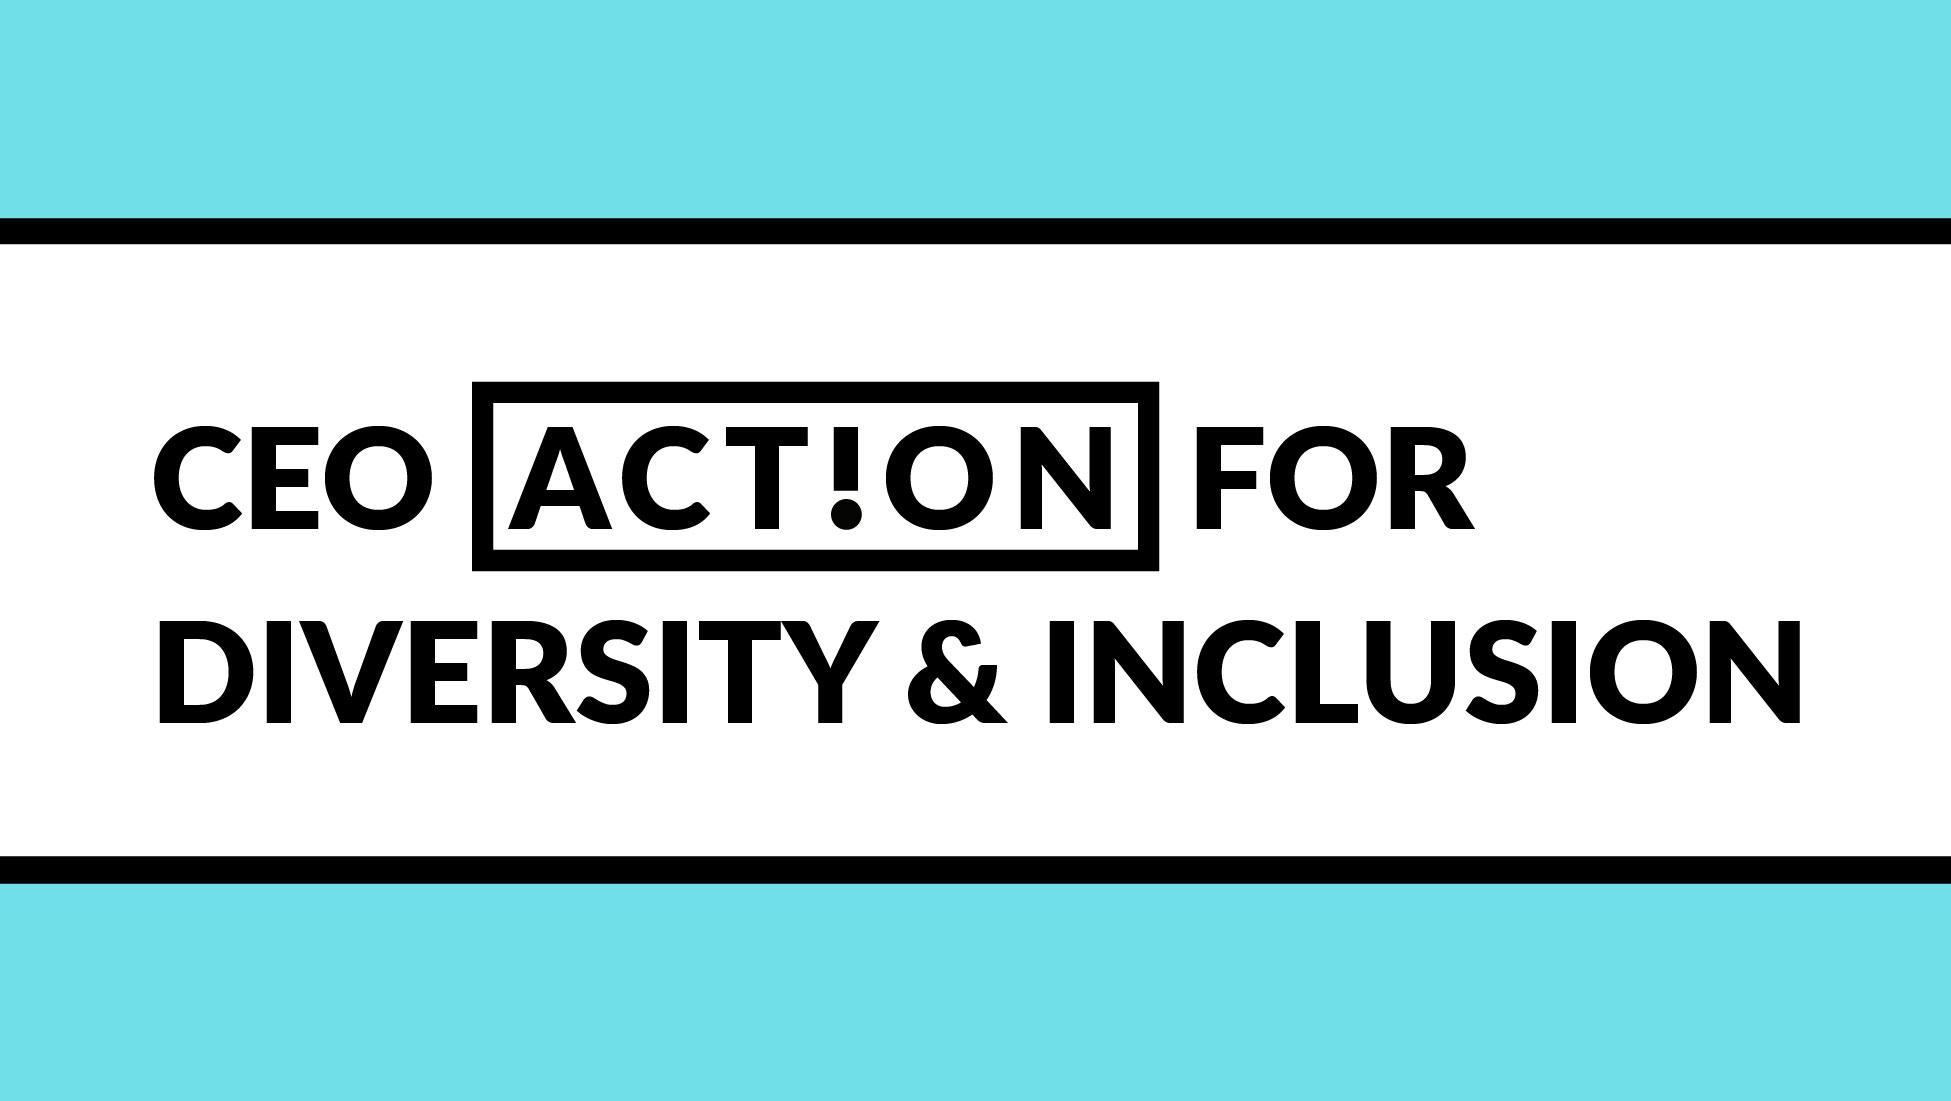 Image of CEO Diversity Action Pledge logo